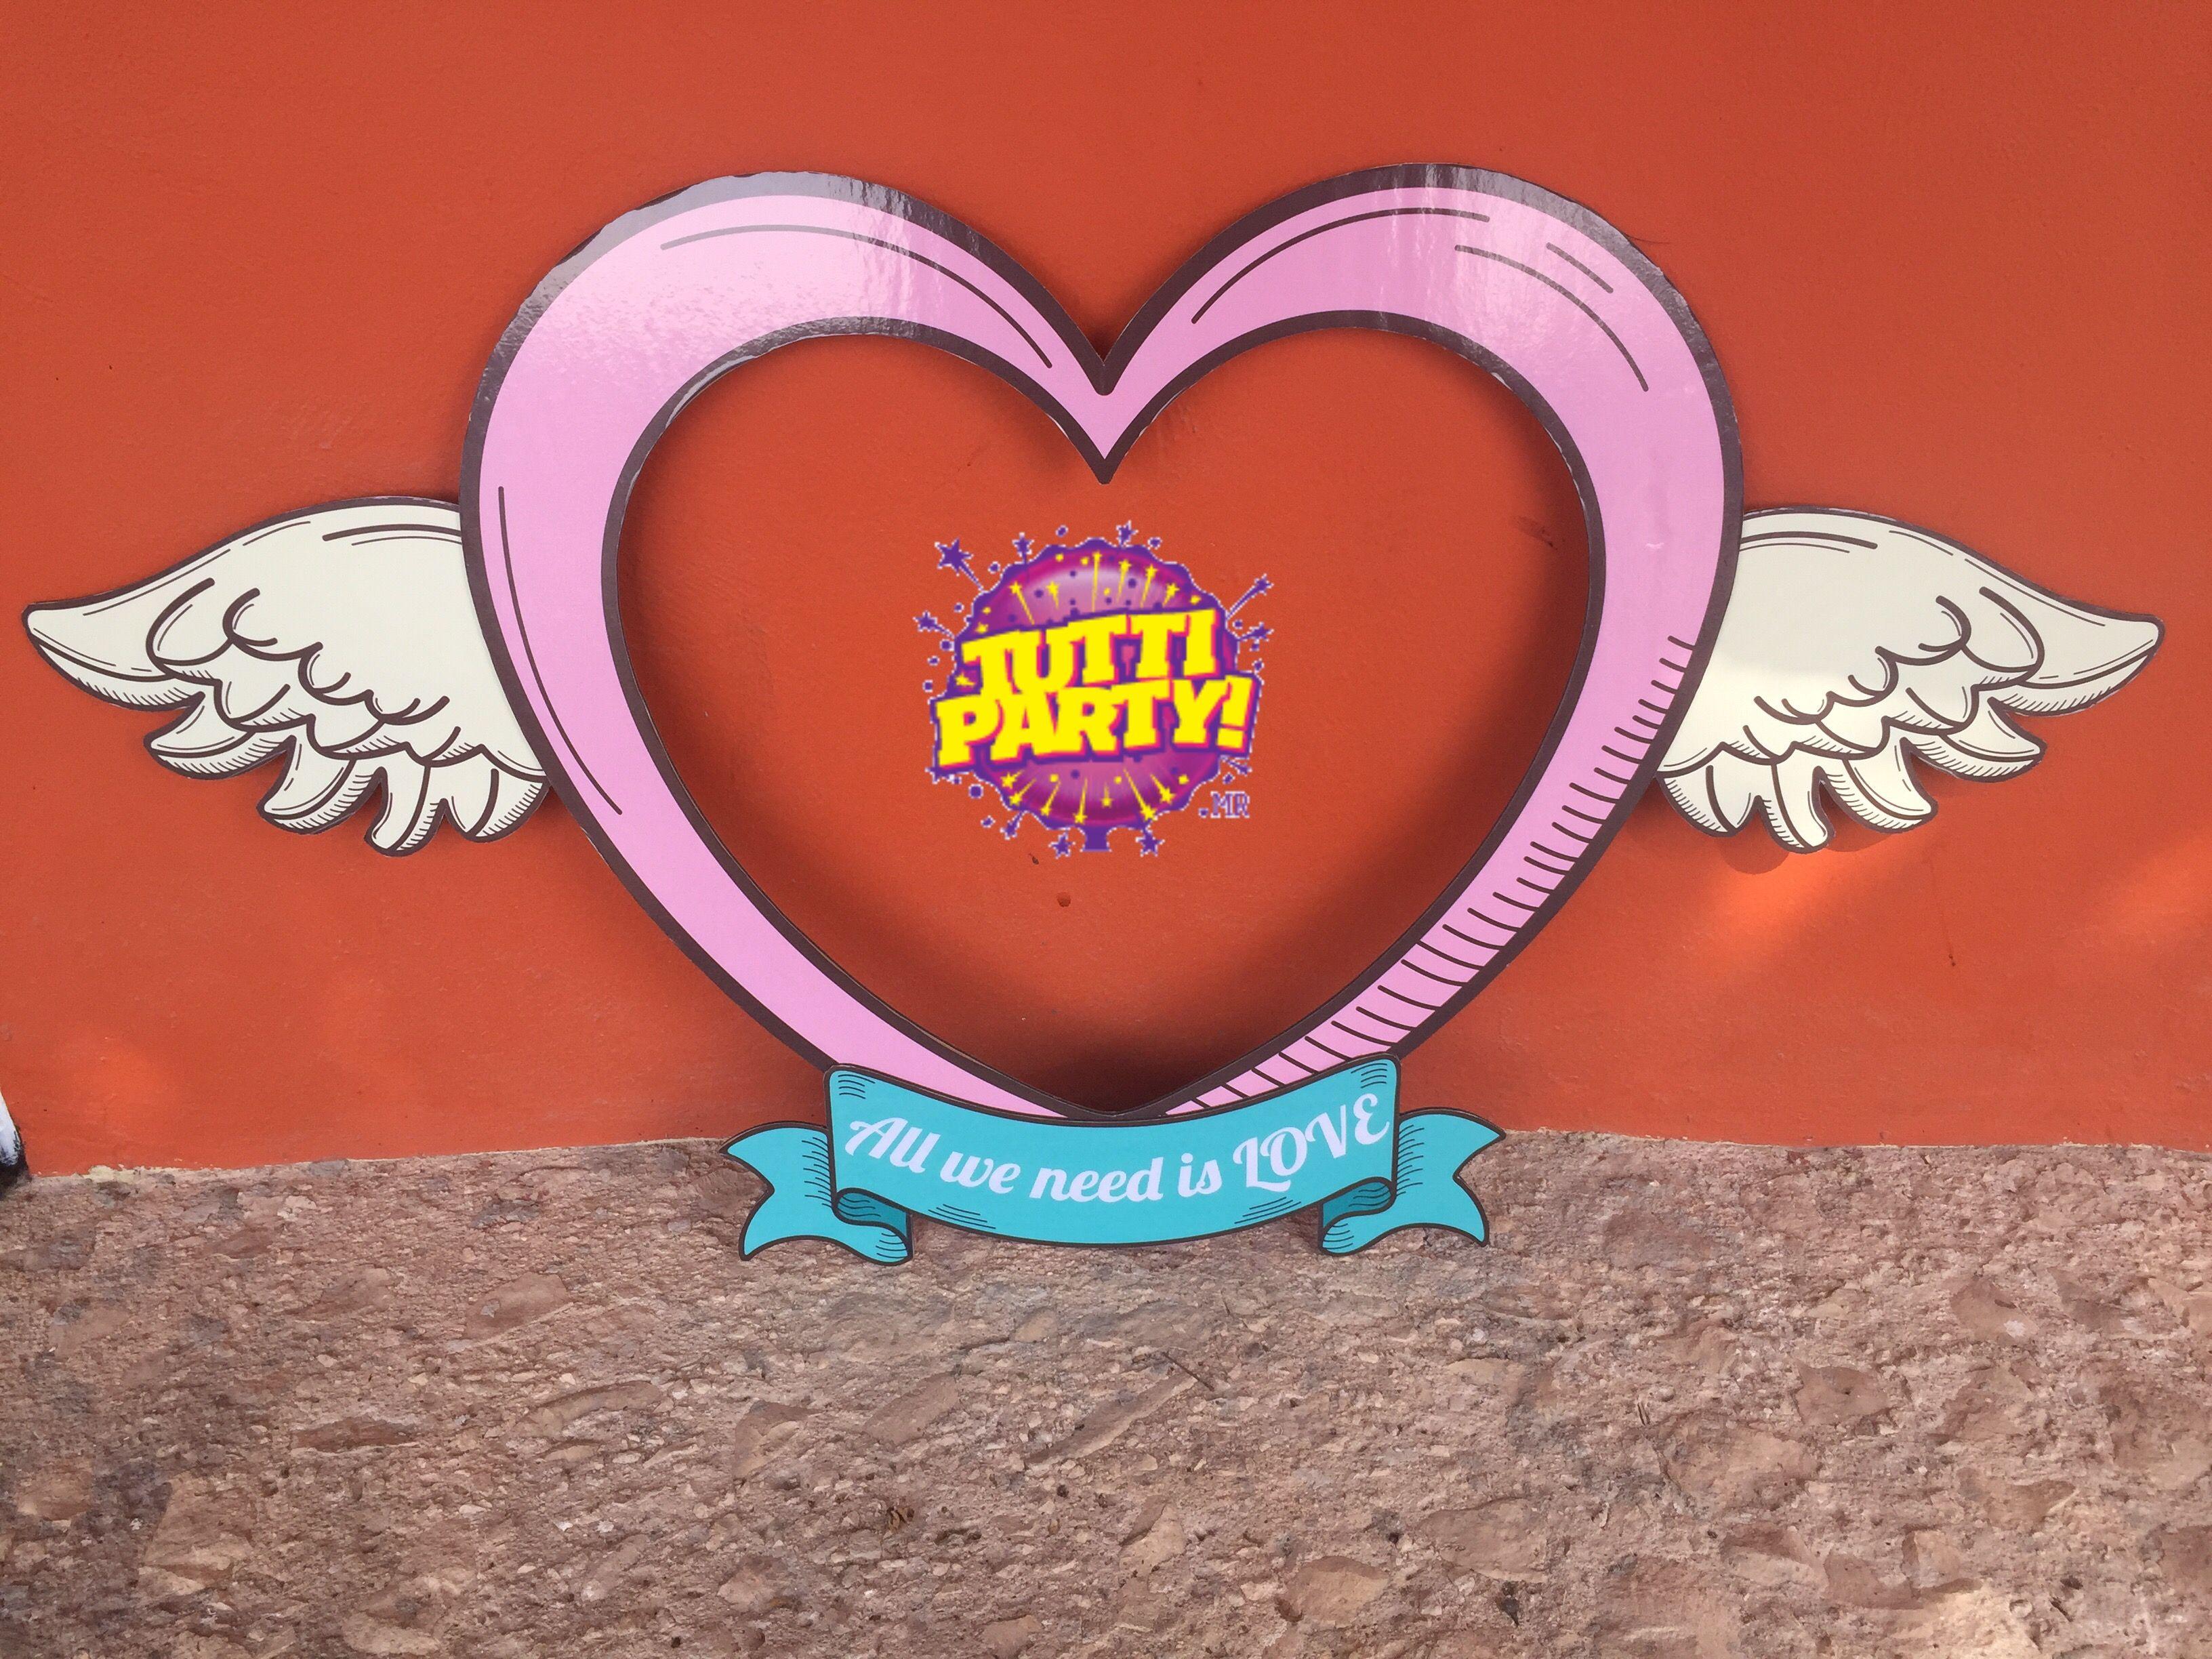 Mega marco Valentines day frase marco Da de san Valentn decoraci³n Da del amor y la amistad megamarcos Tutti Party playa del carmen 984